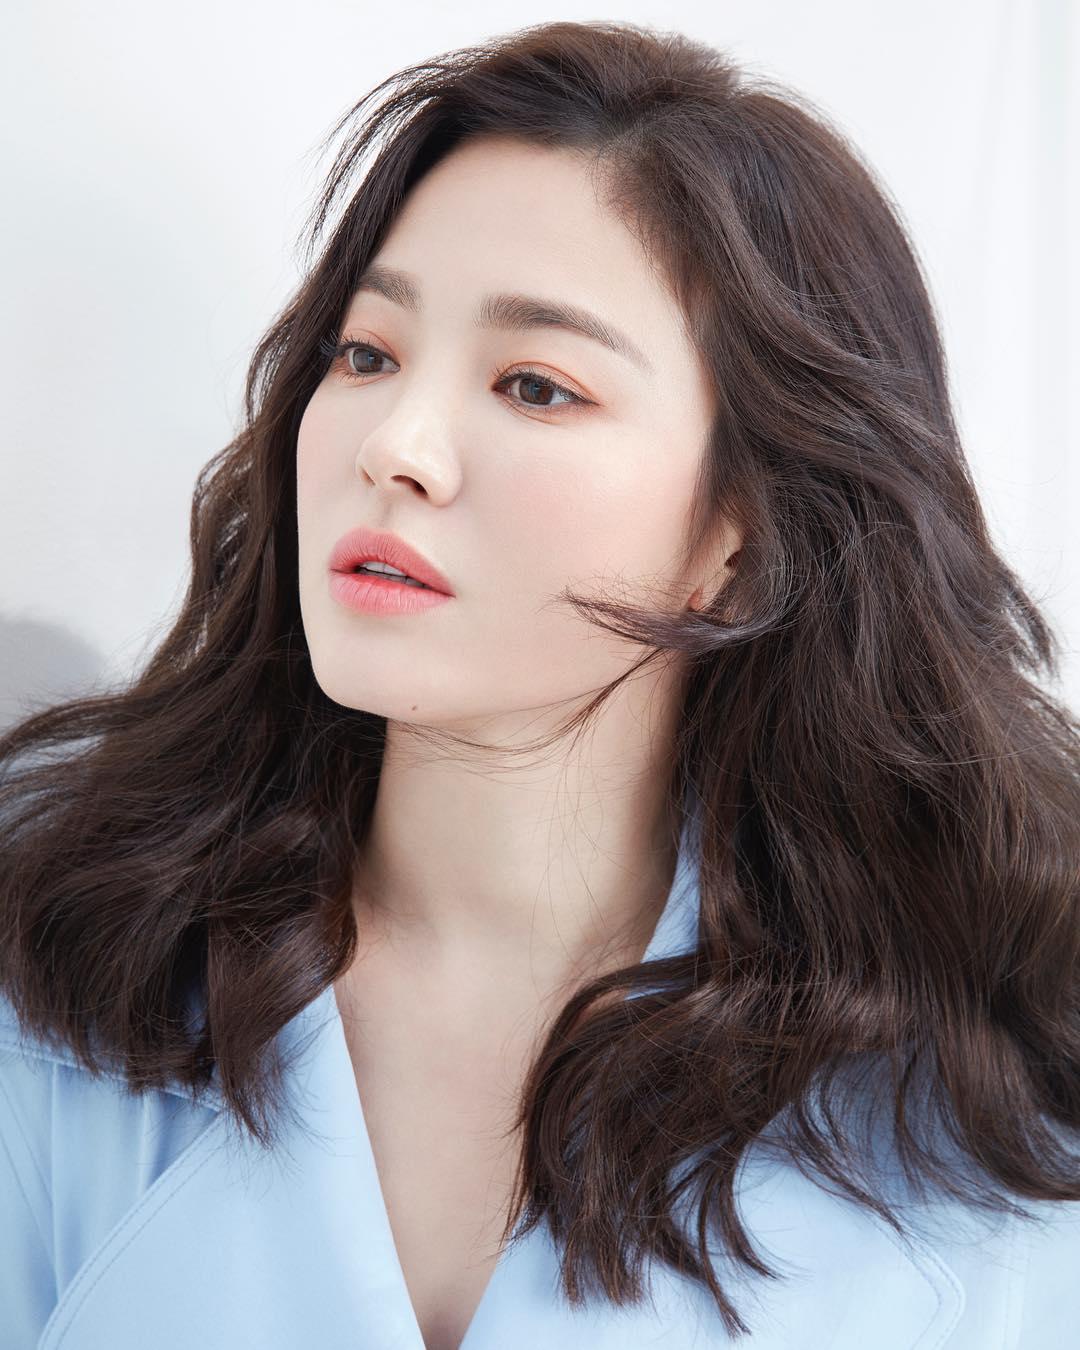 song hye kyo da trắng